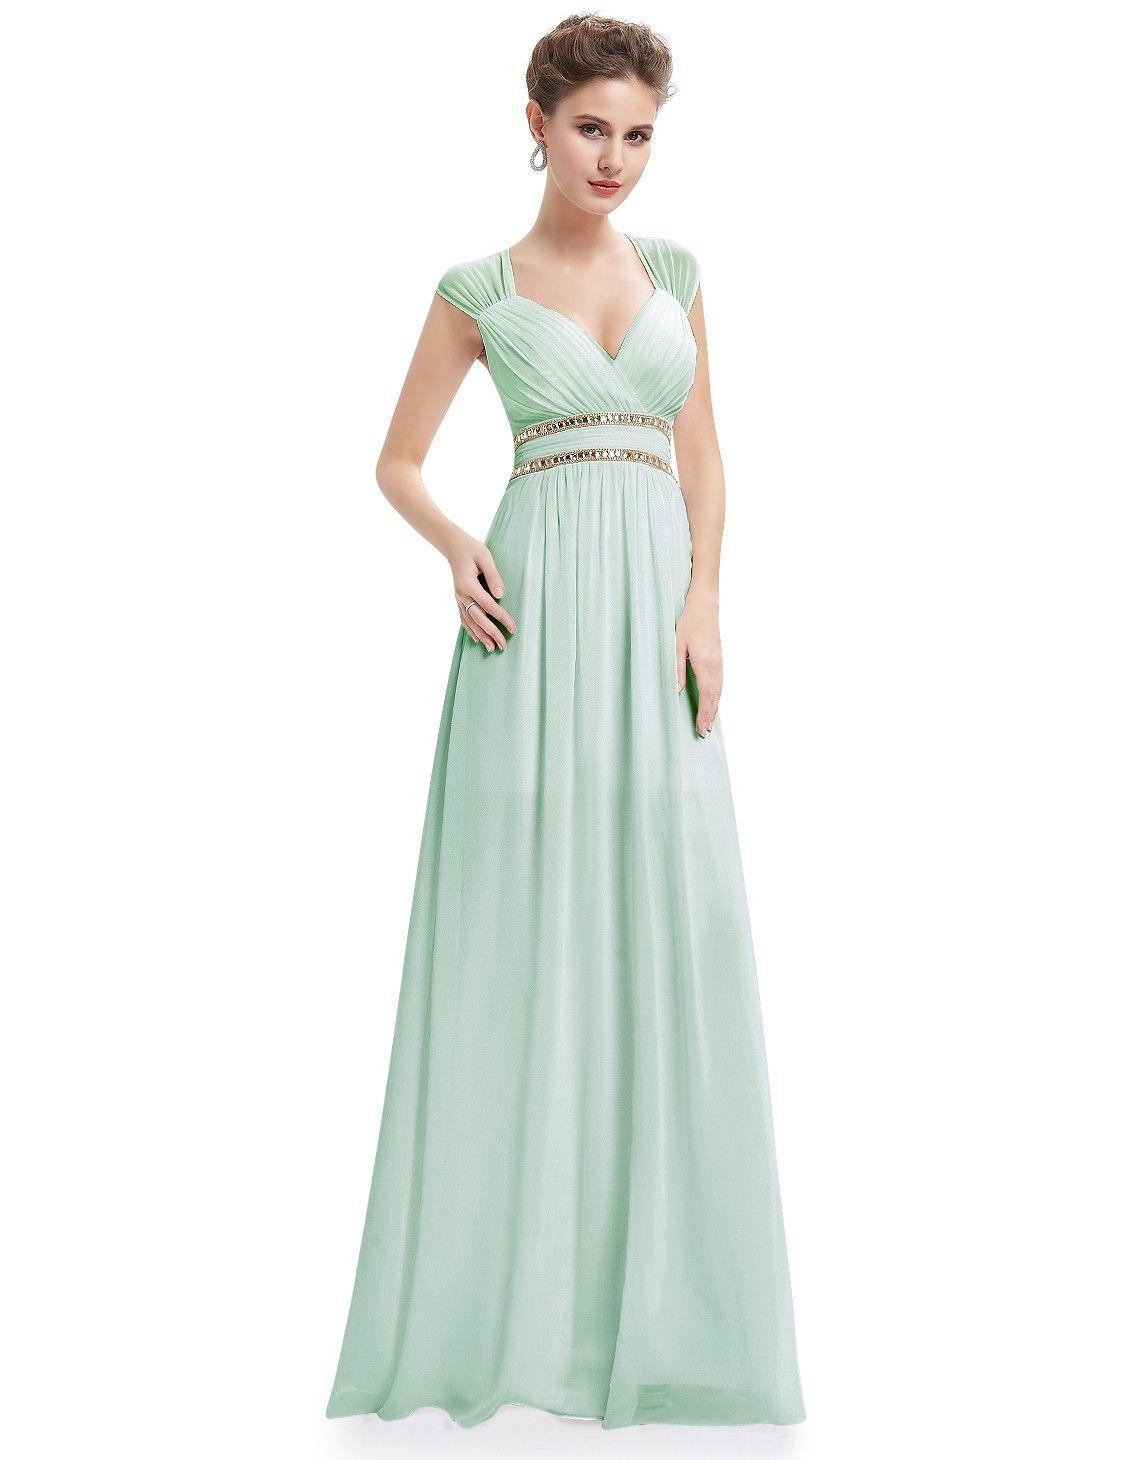 8014e5a3f34389 Sleeveless Grecian Style Evening Dress